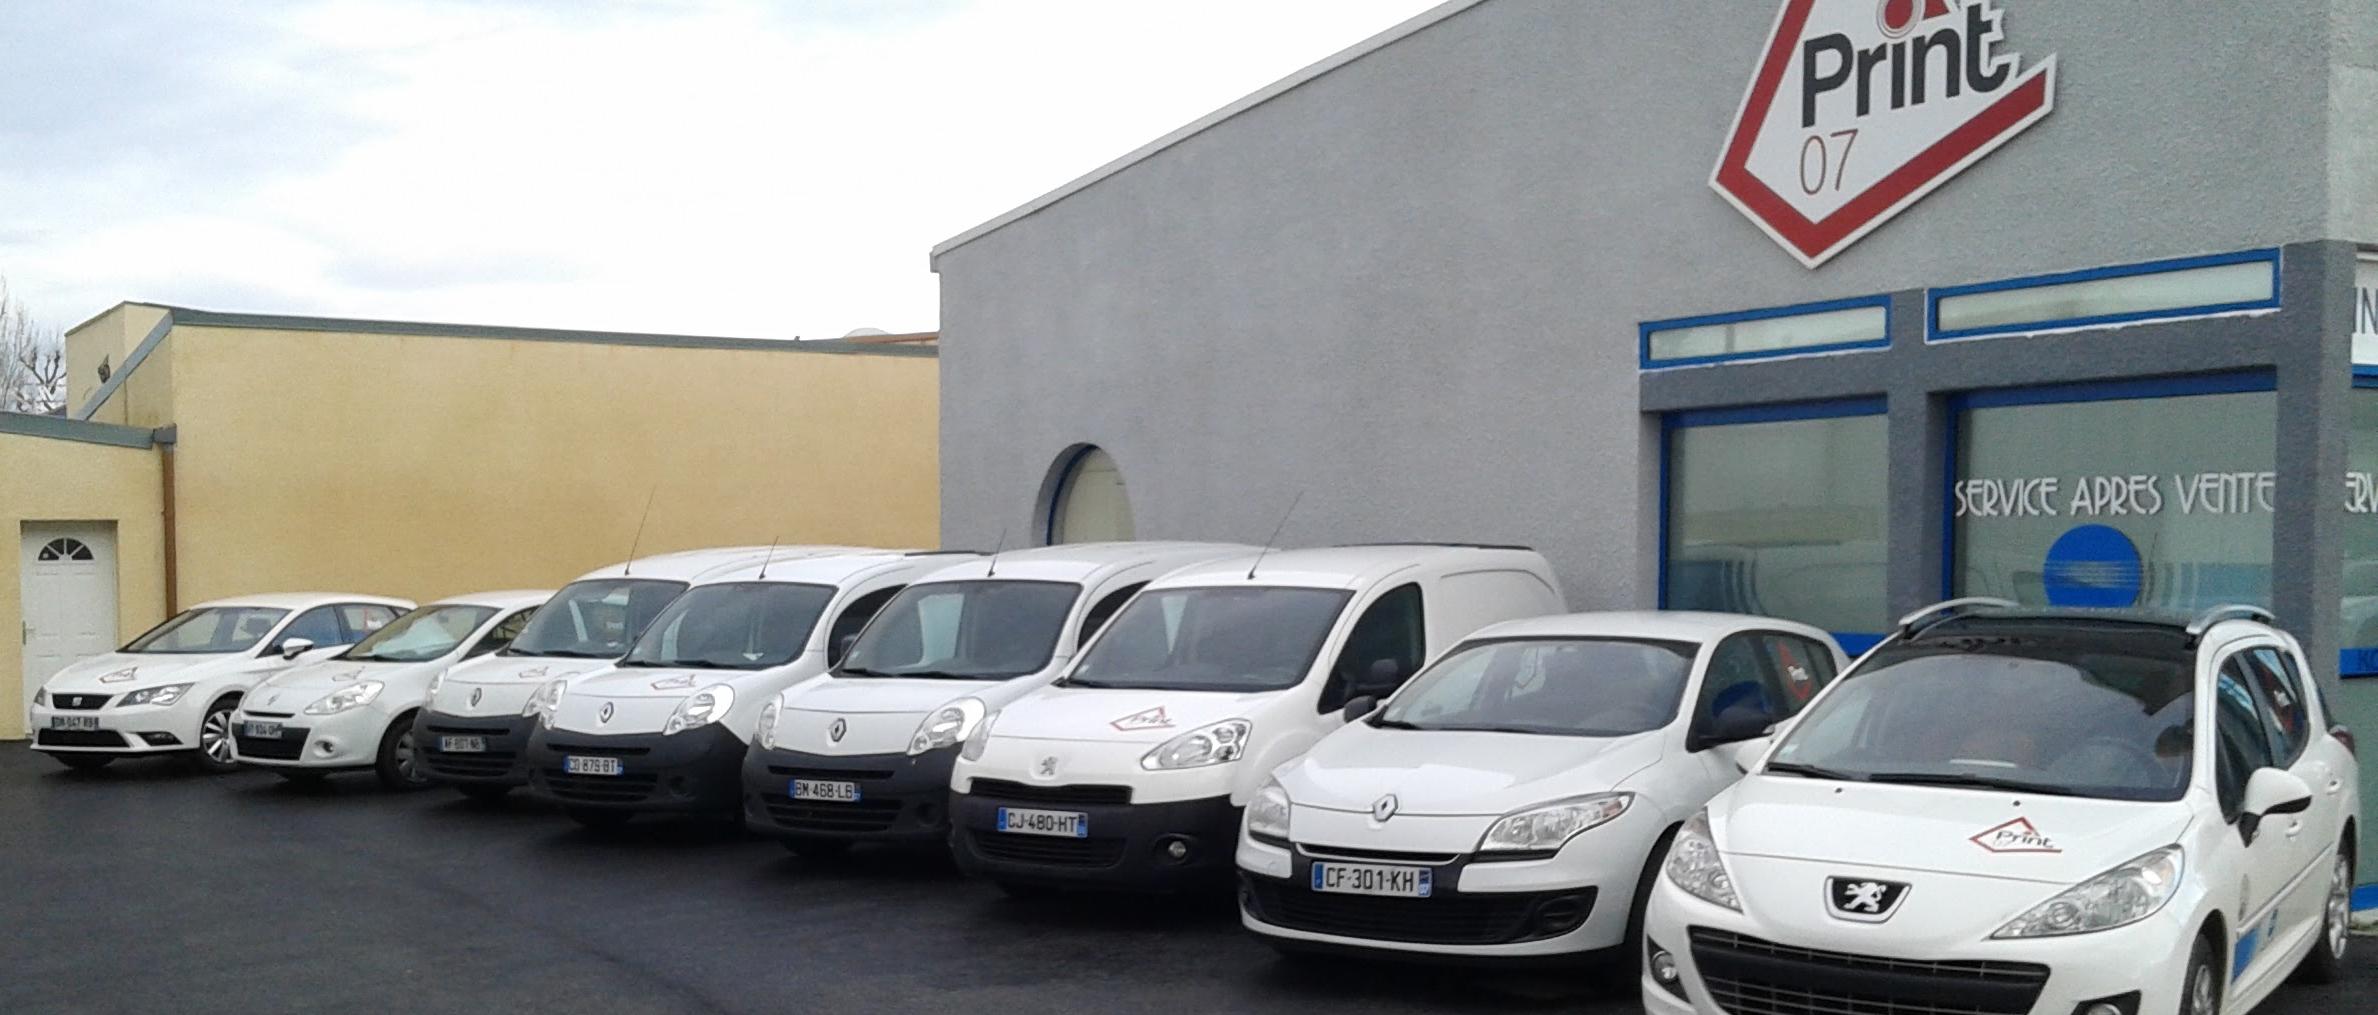 SAV maintenance de vos Imprimantes et Solutions d'impression Konica Minolta